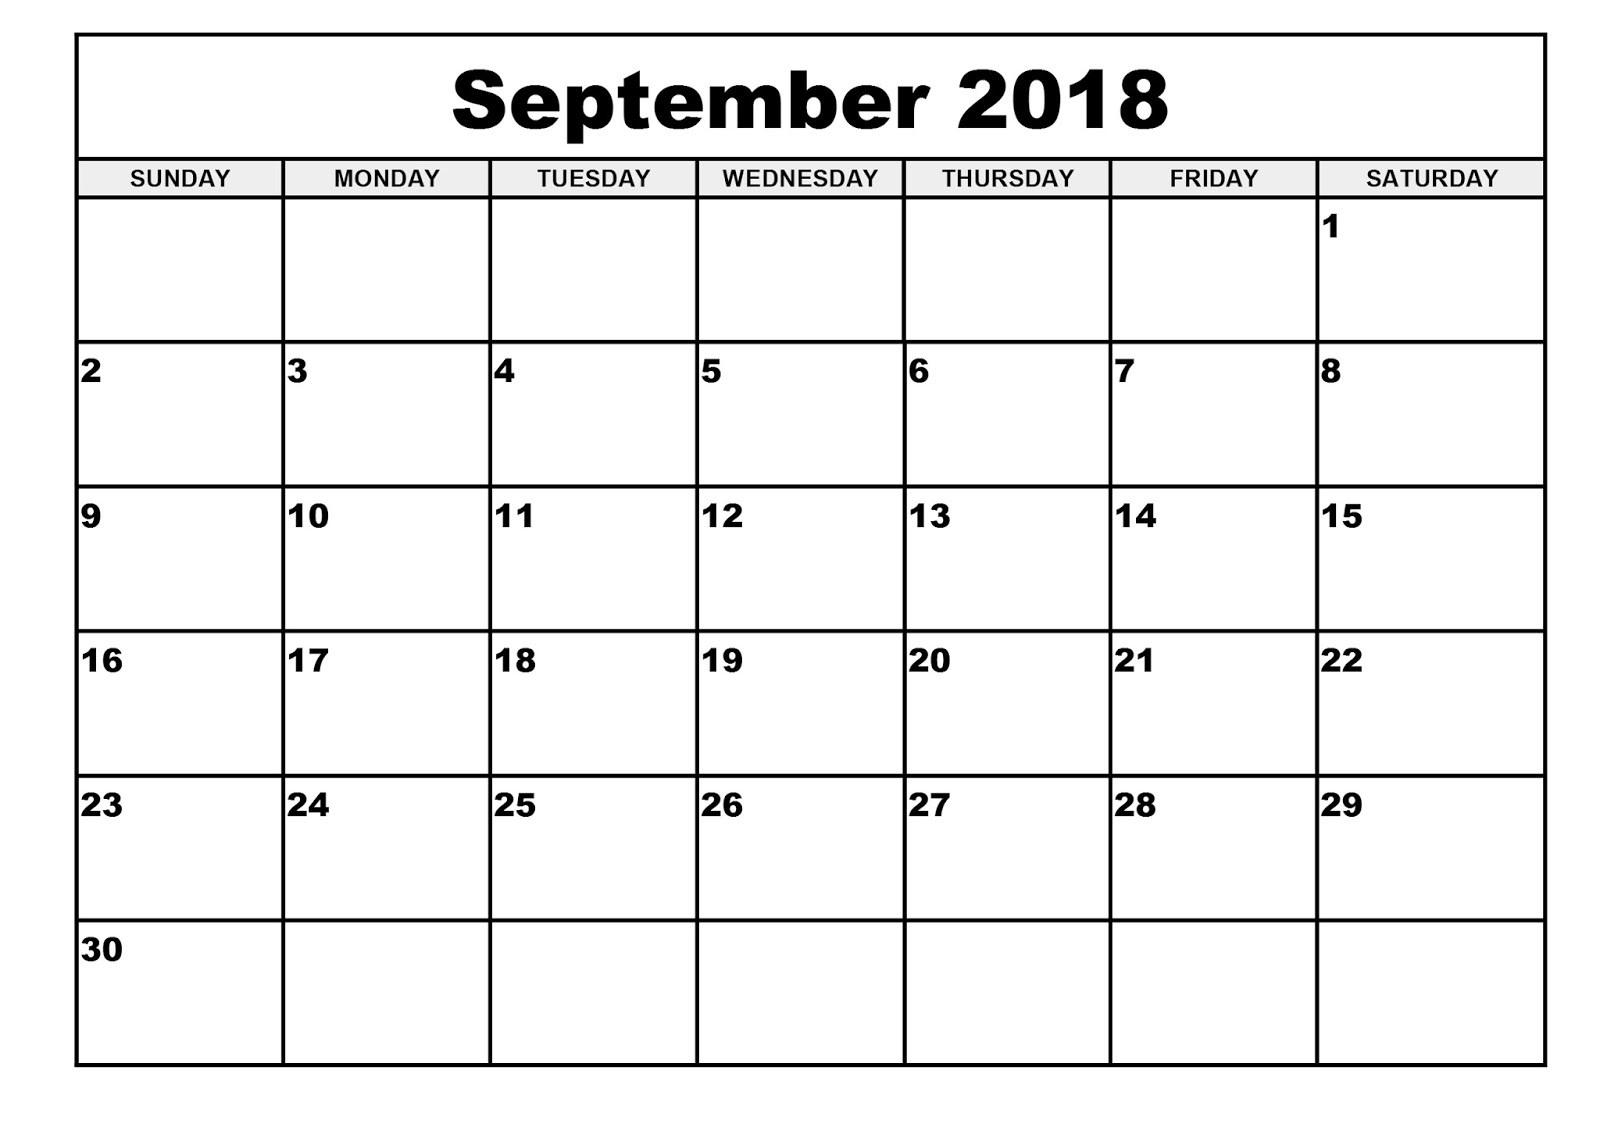 Free September 2018 Calendar In Printable Format Templates in August And September Calendar Template